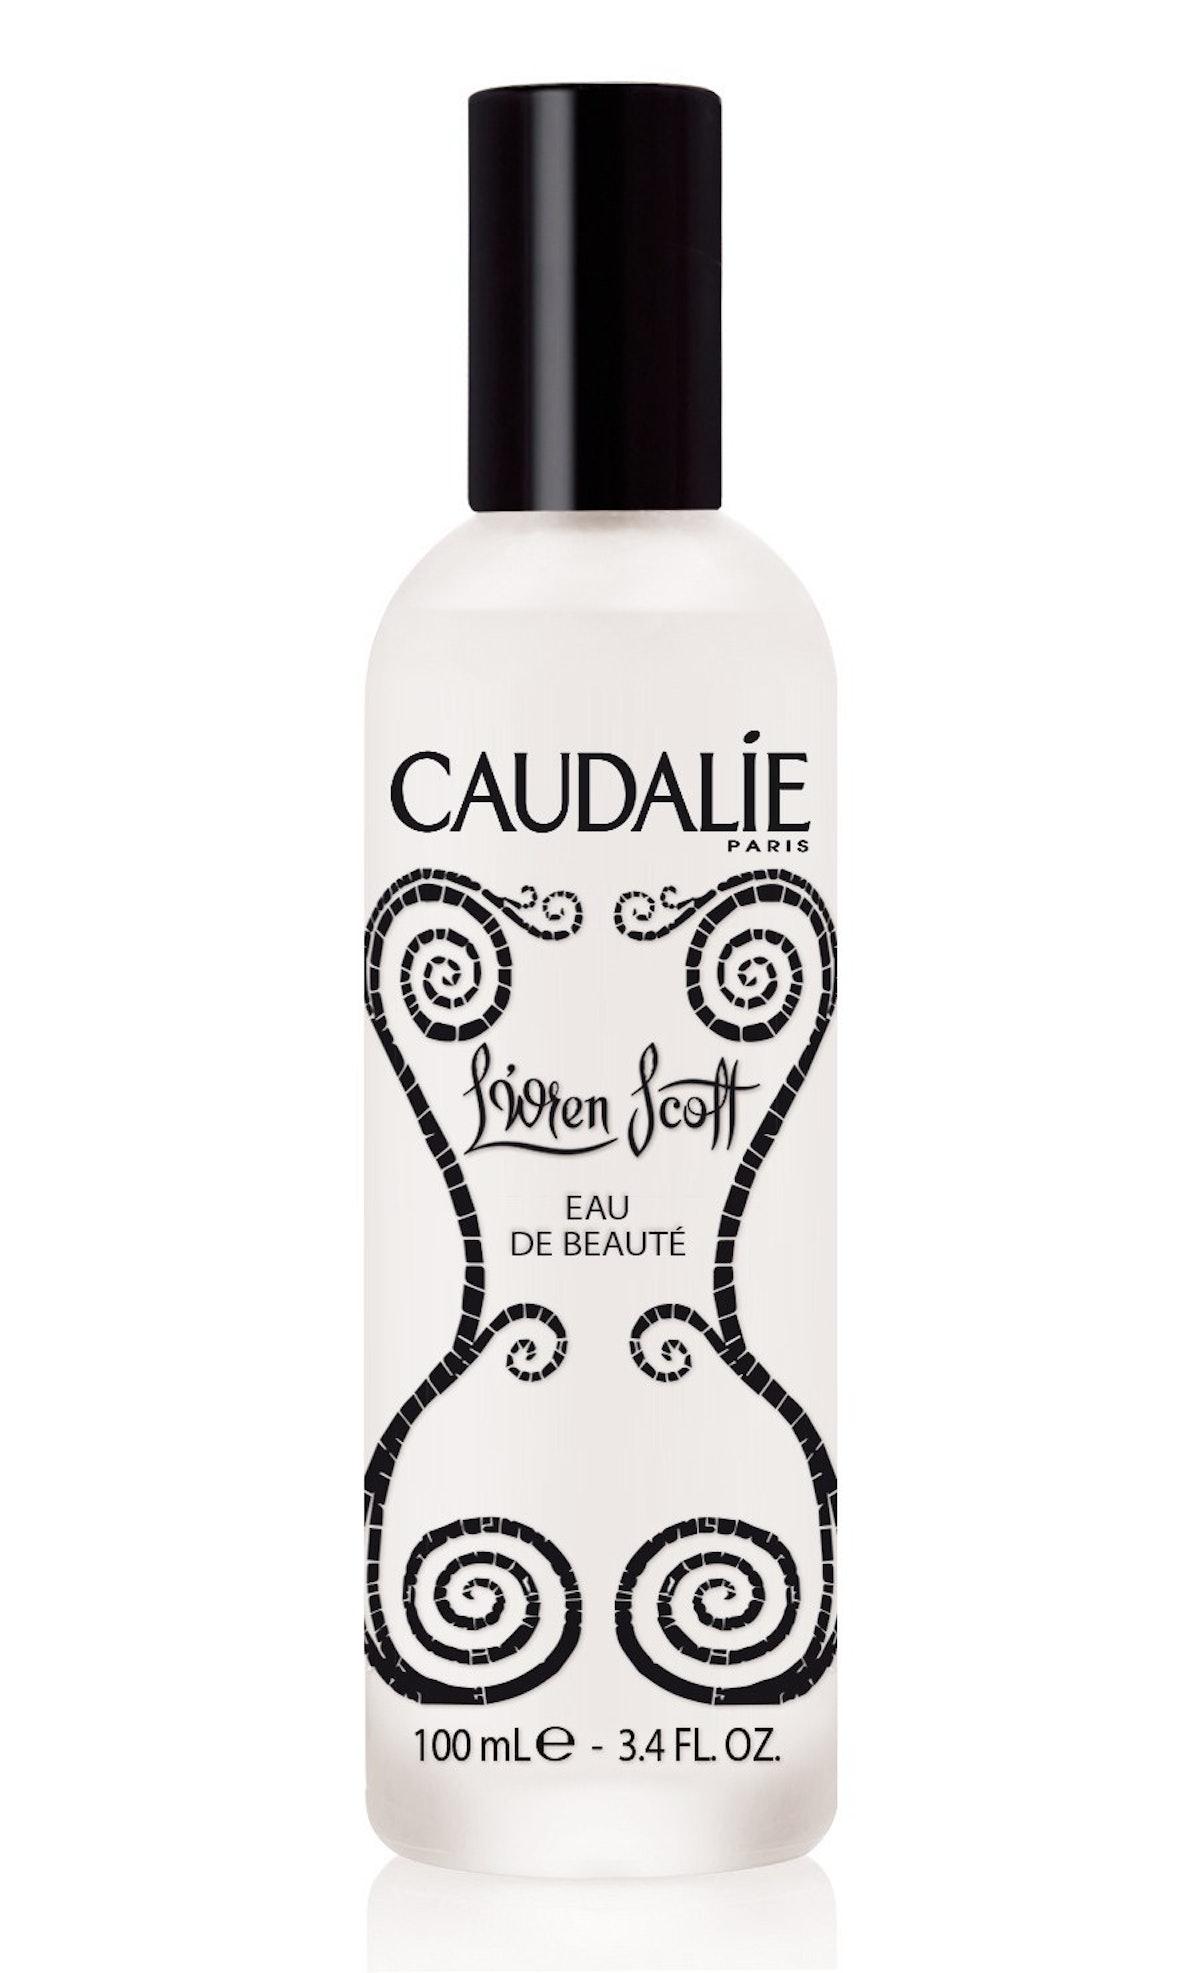 Caudalie limited edition Beauty Elixir by L'Wren Scott, $49, caudalie.com.